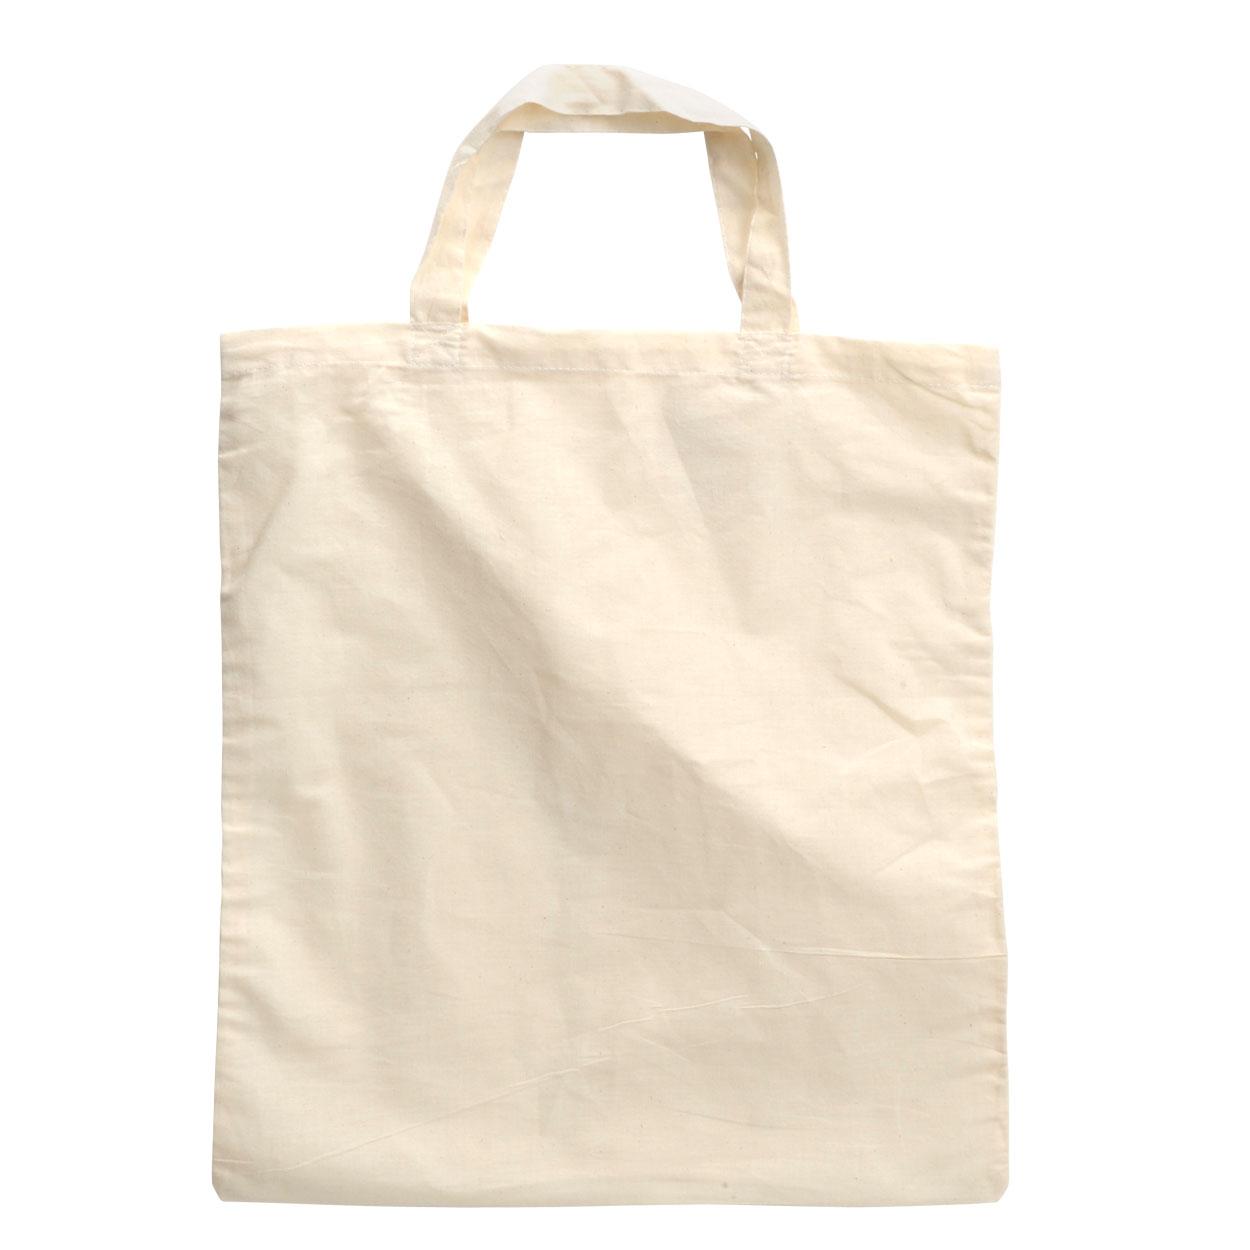 d6a85138854 Katoenen Draagtas XL - Blanco online kopen | Lobbes.nl